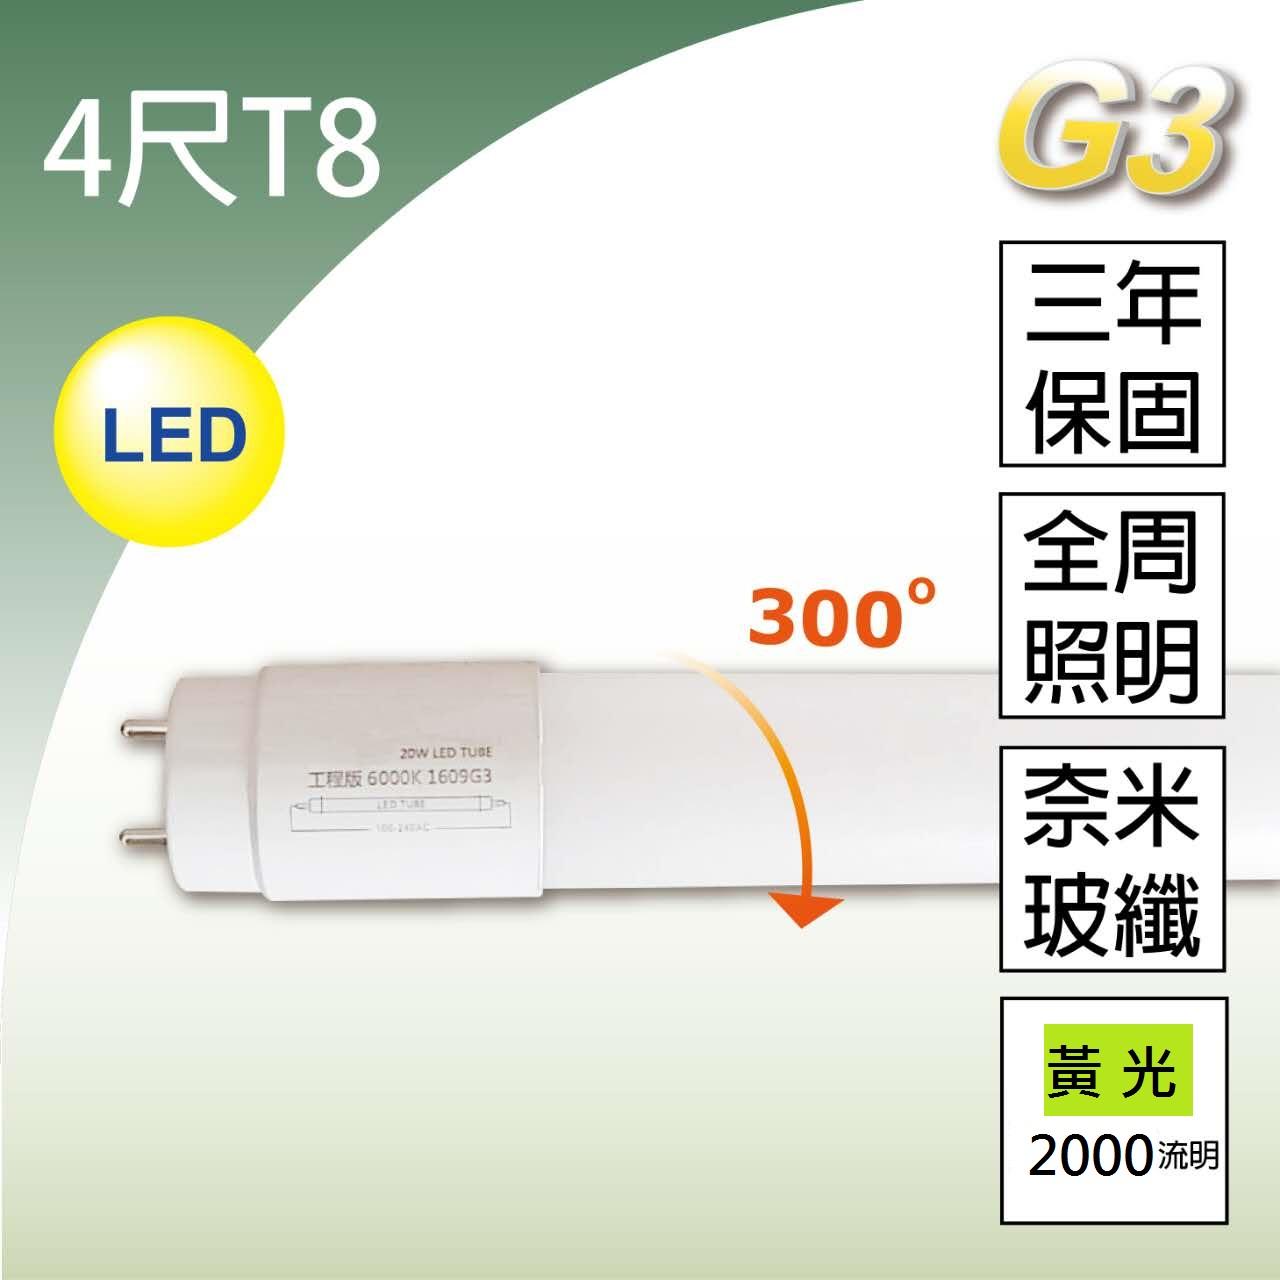 T8 LED 4尺奈米玻纖燈管~3年保固 20W黃光-25入特價